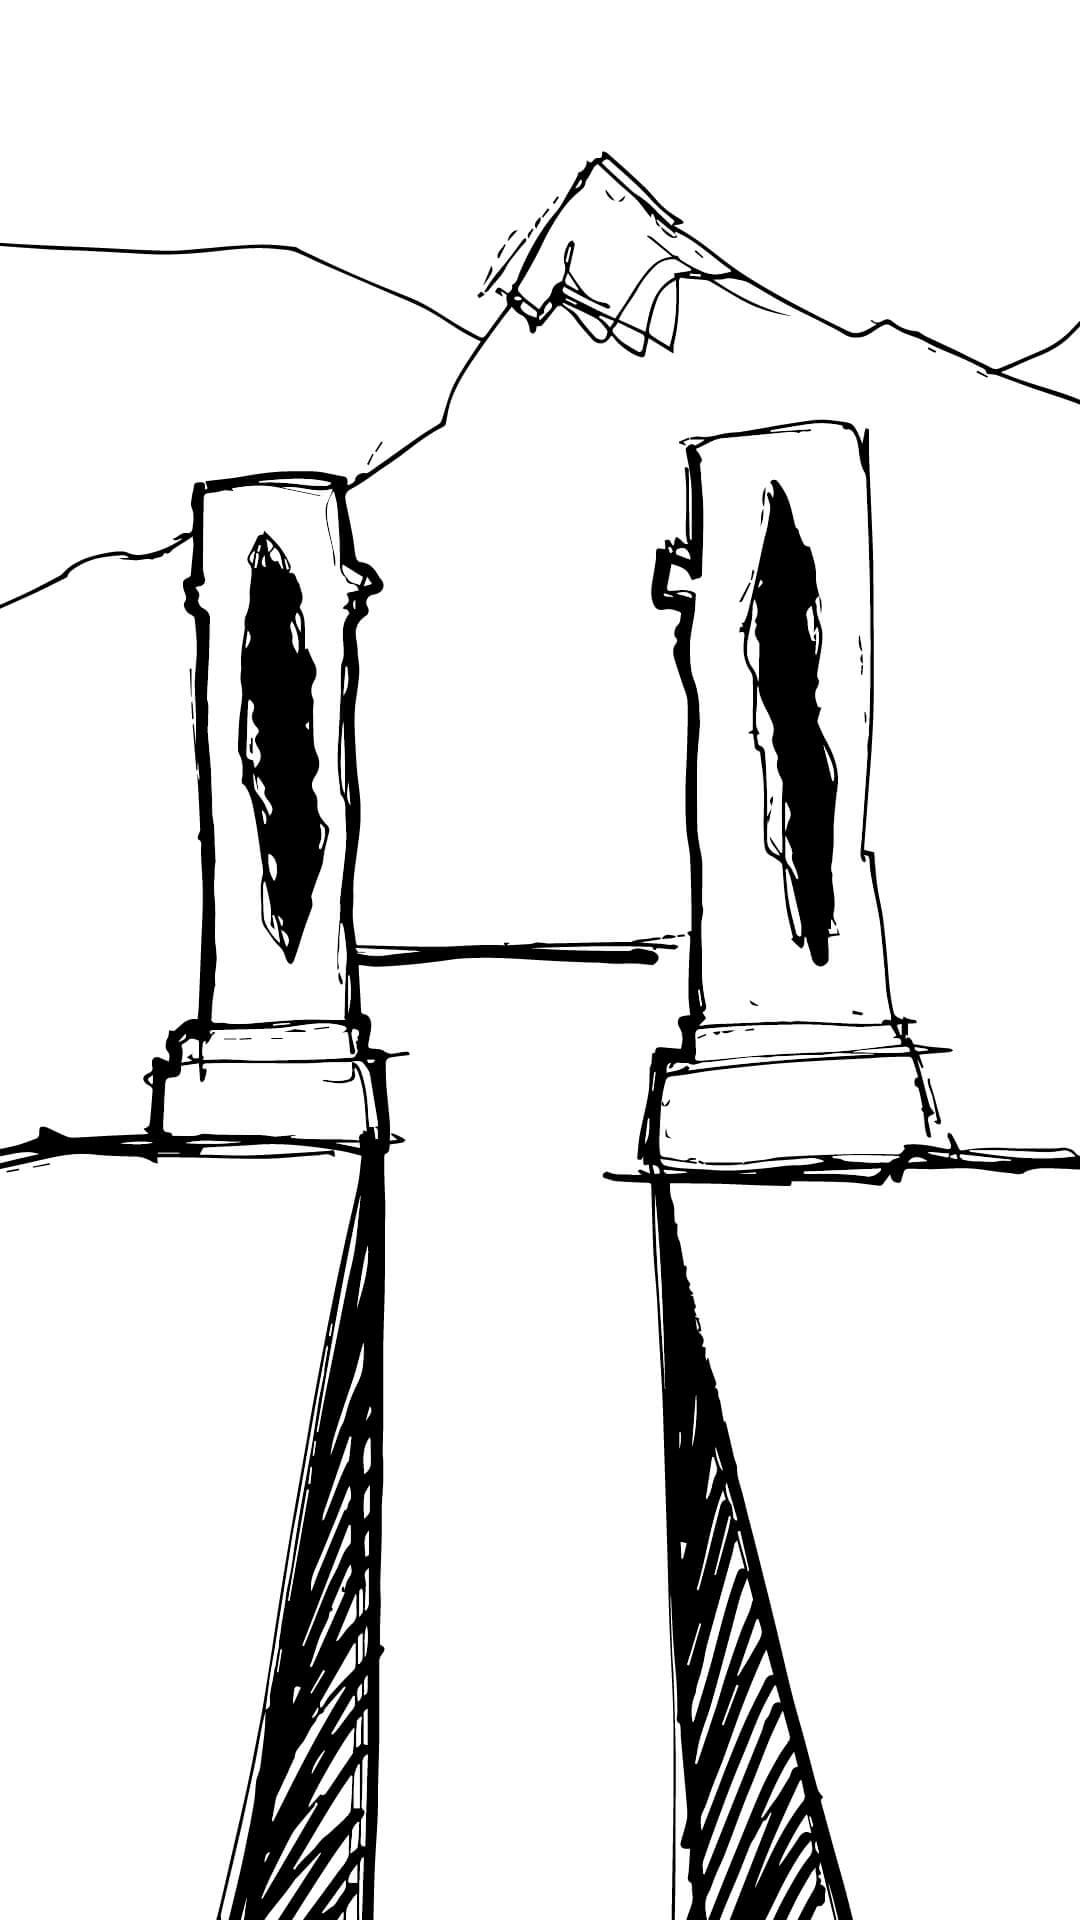 13-THERAW-THECOOKED-AARON-NACHTAILER-ART-ARTIST-CRYSTALS-SCULPTURES-VERTICAL